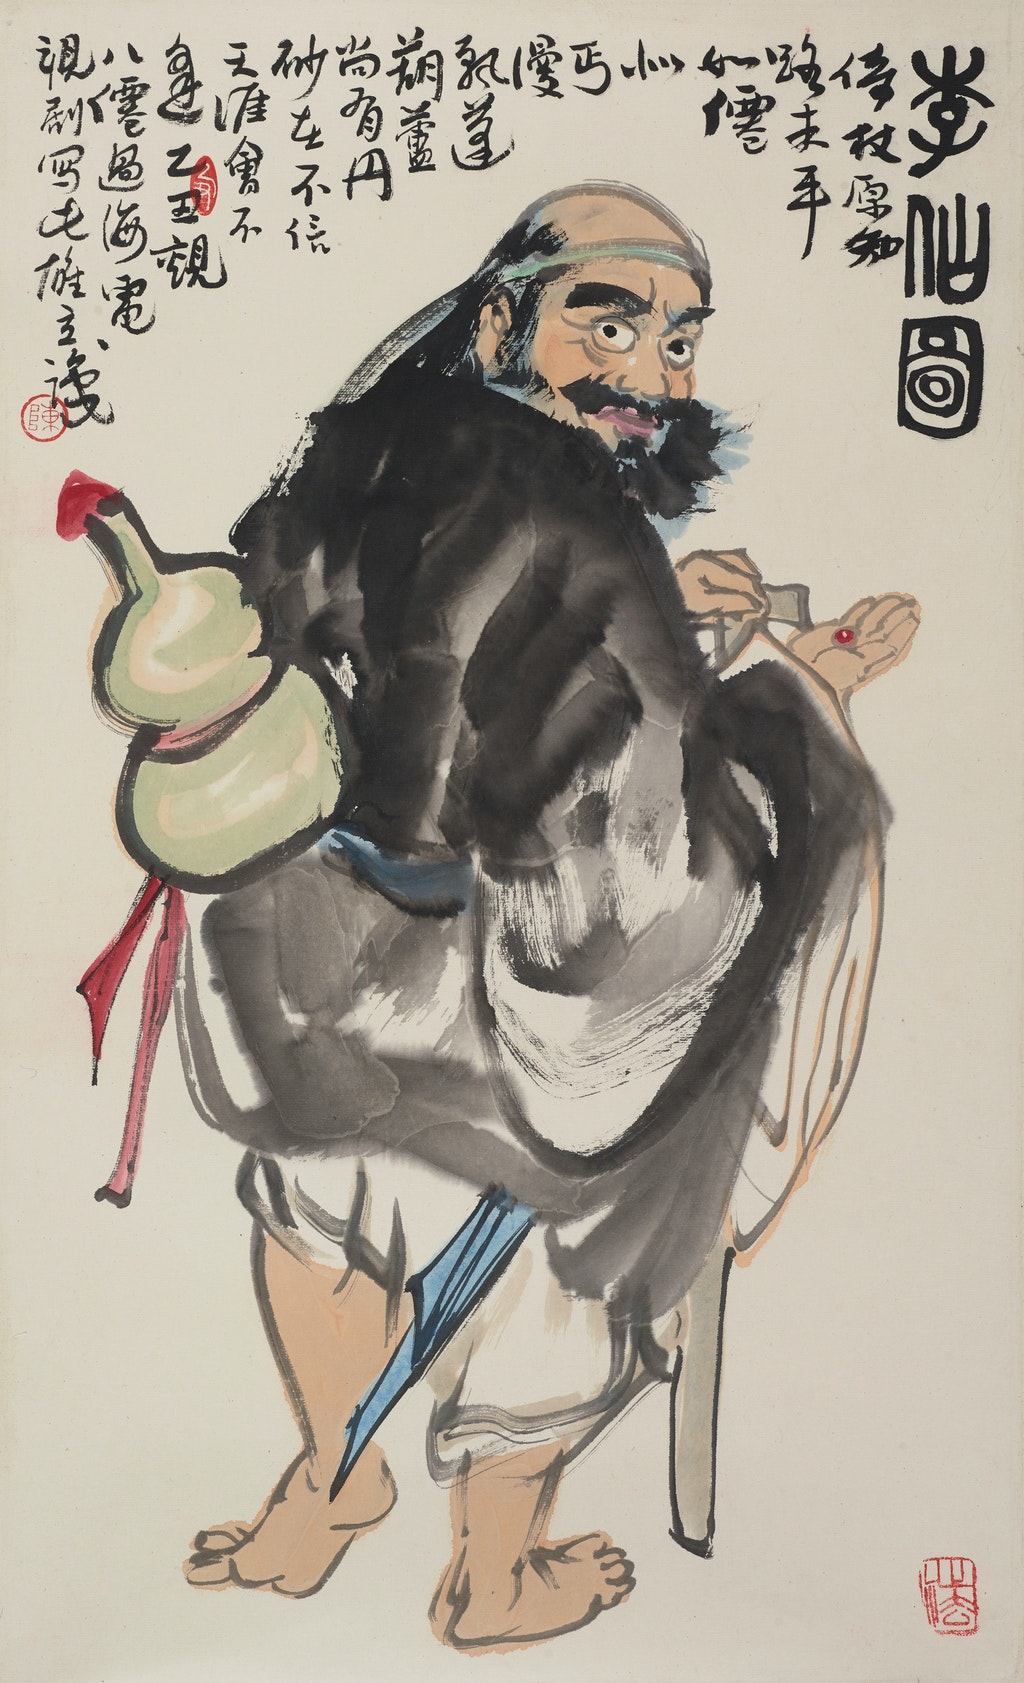 Chen Xiongli Immortal man 1985, Art Gallery of New South Wales © Chen Xiongli